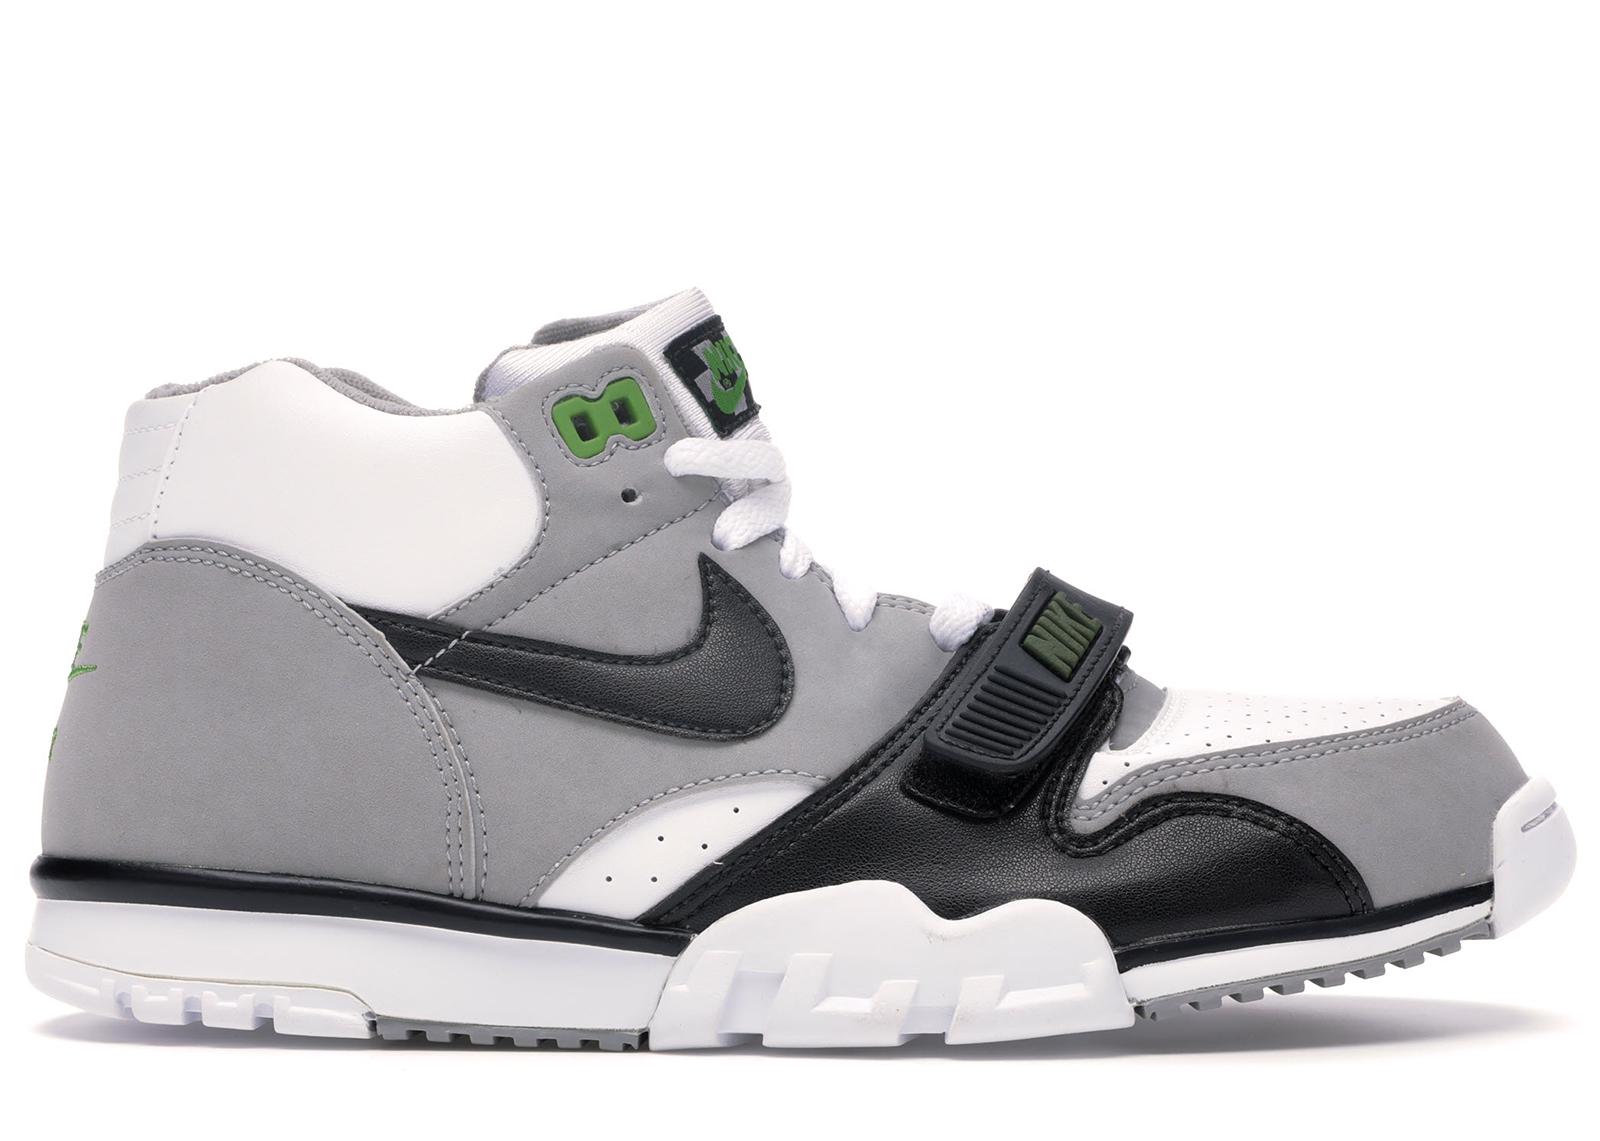 Nike Air Trainer 1 Mid Chlorophyll